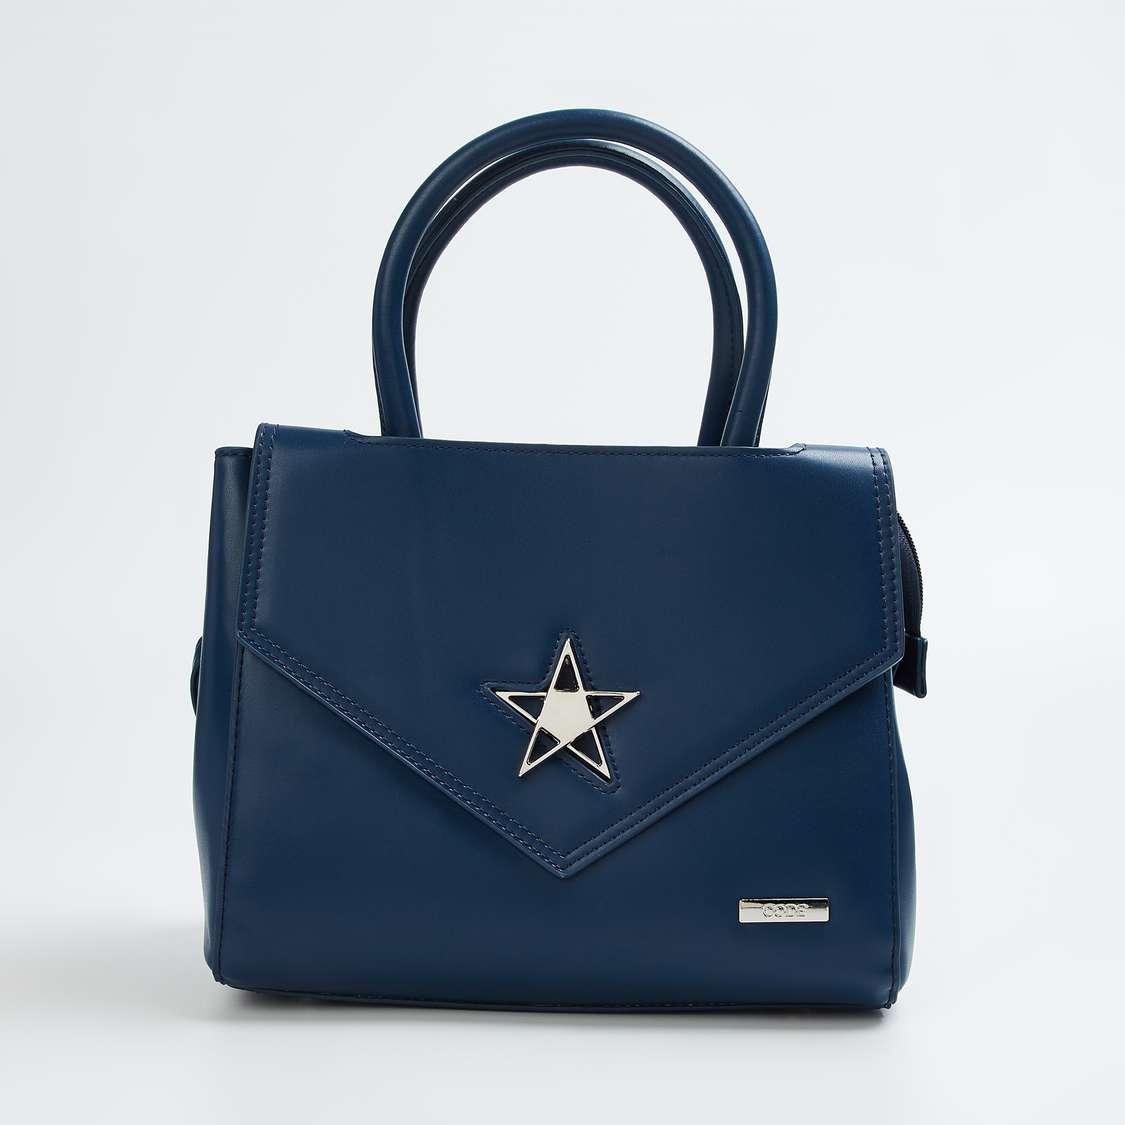 CODE Embellished Zip-Closure Handbag